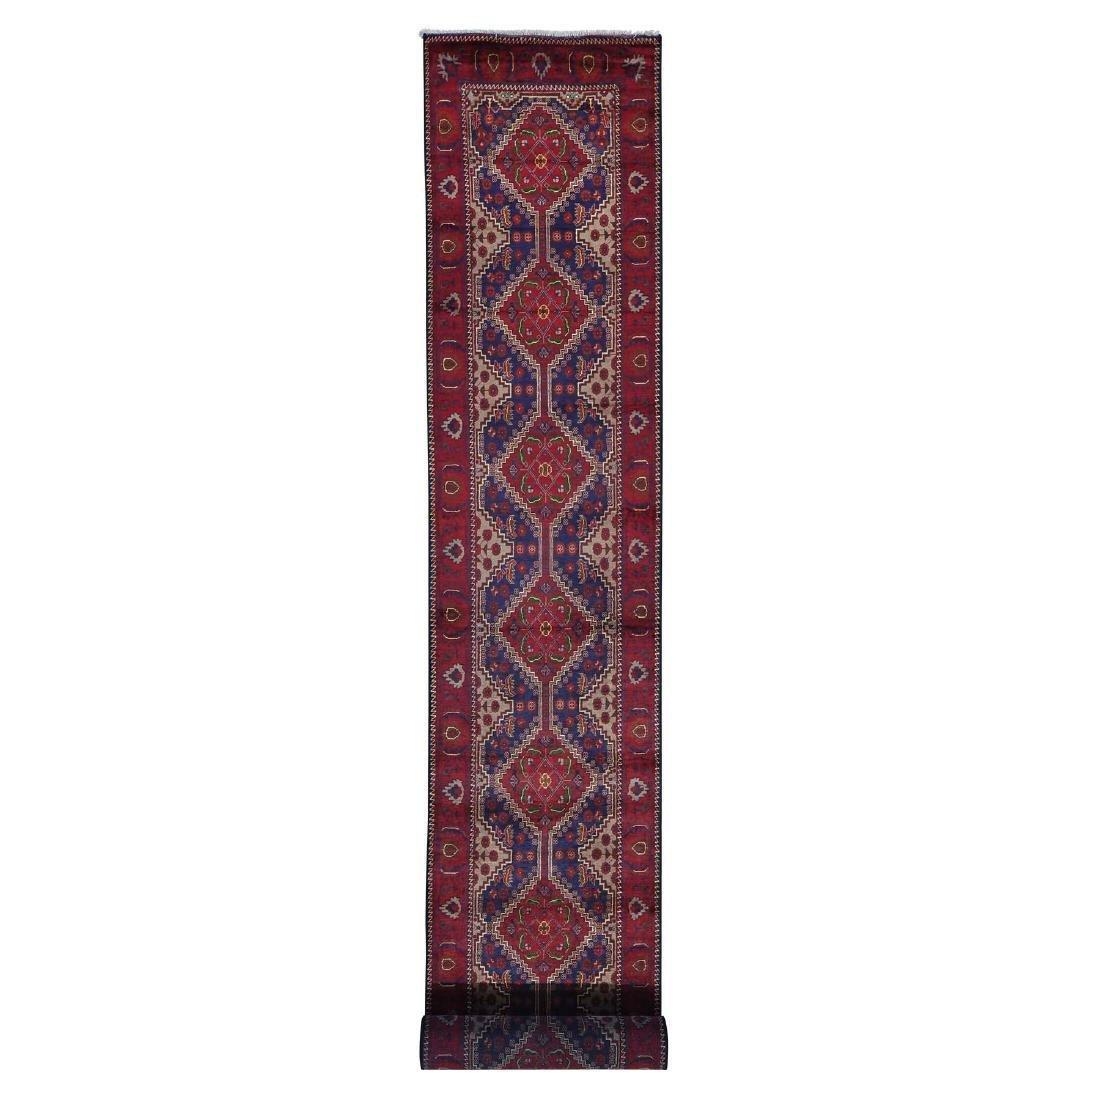 Runner Afghan Khamyab Handmade Rug 2.7x18.4